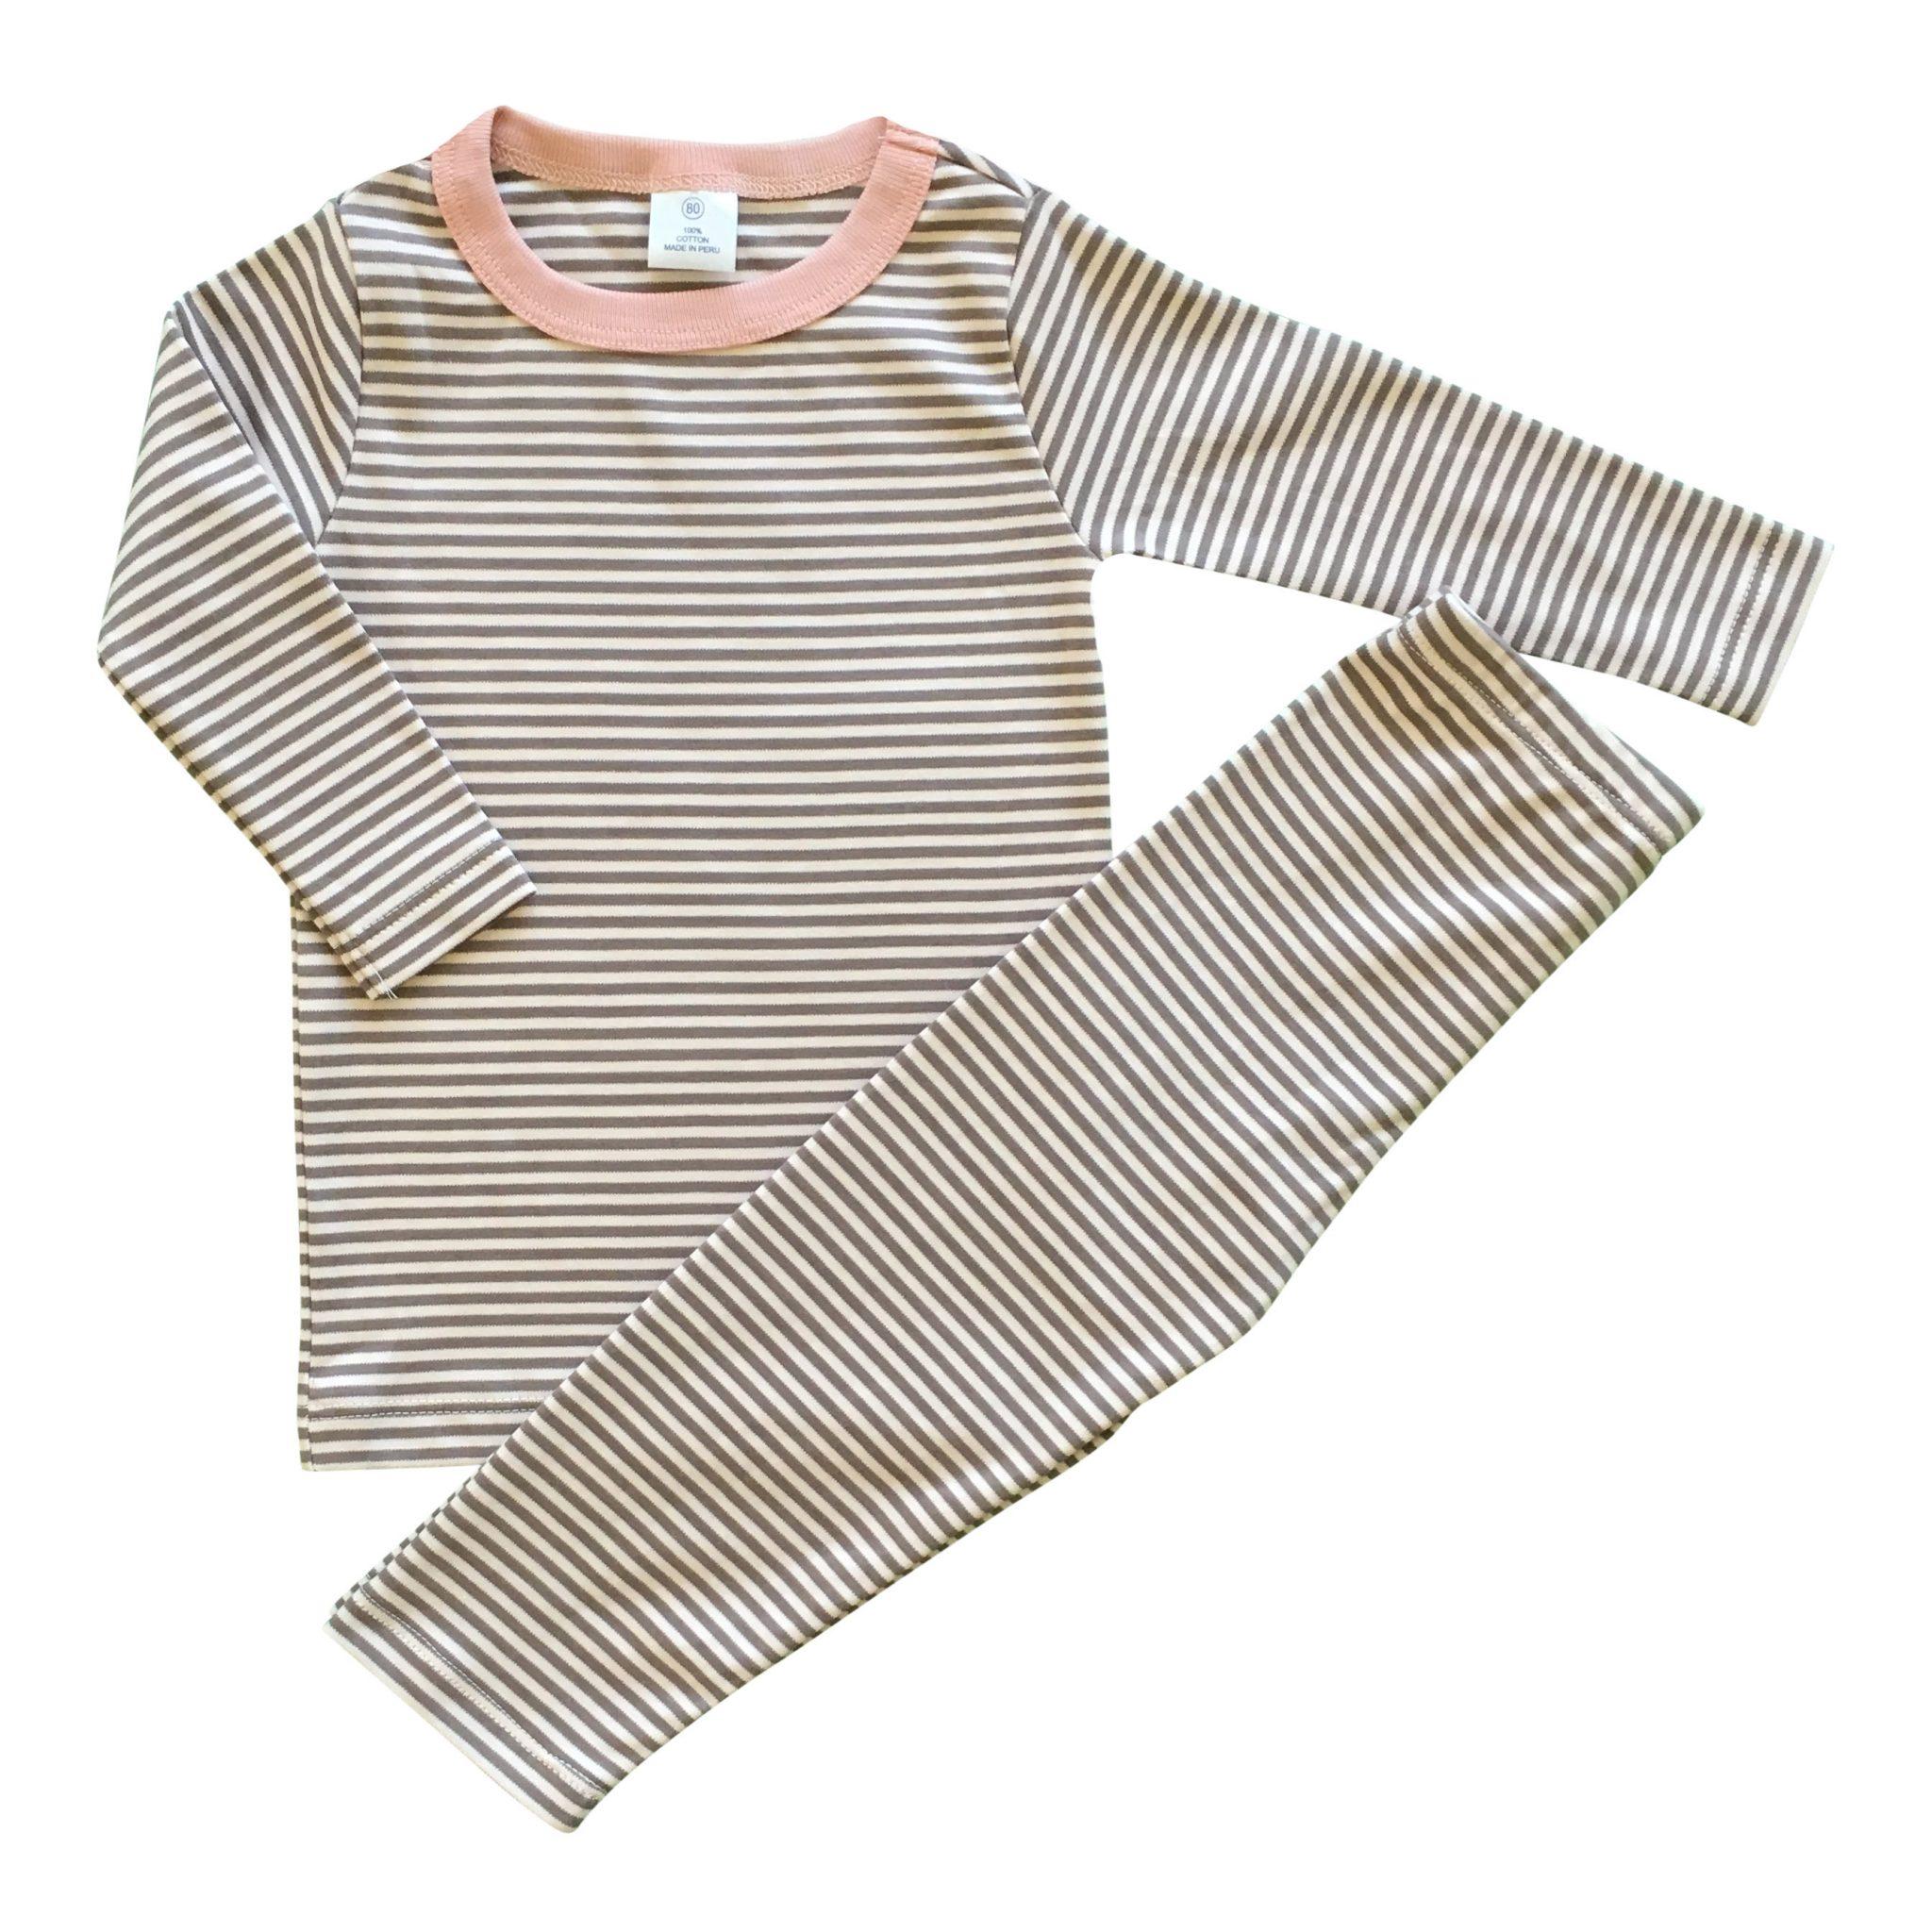 Pijama Listado 2 Piezas Pima Orgánico • Moonwear 1fe2f5be7f4c